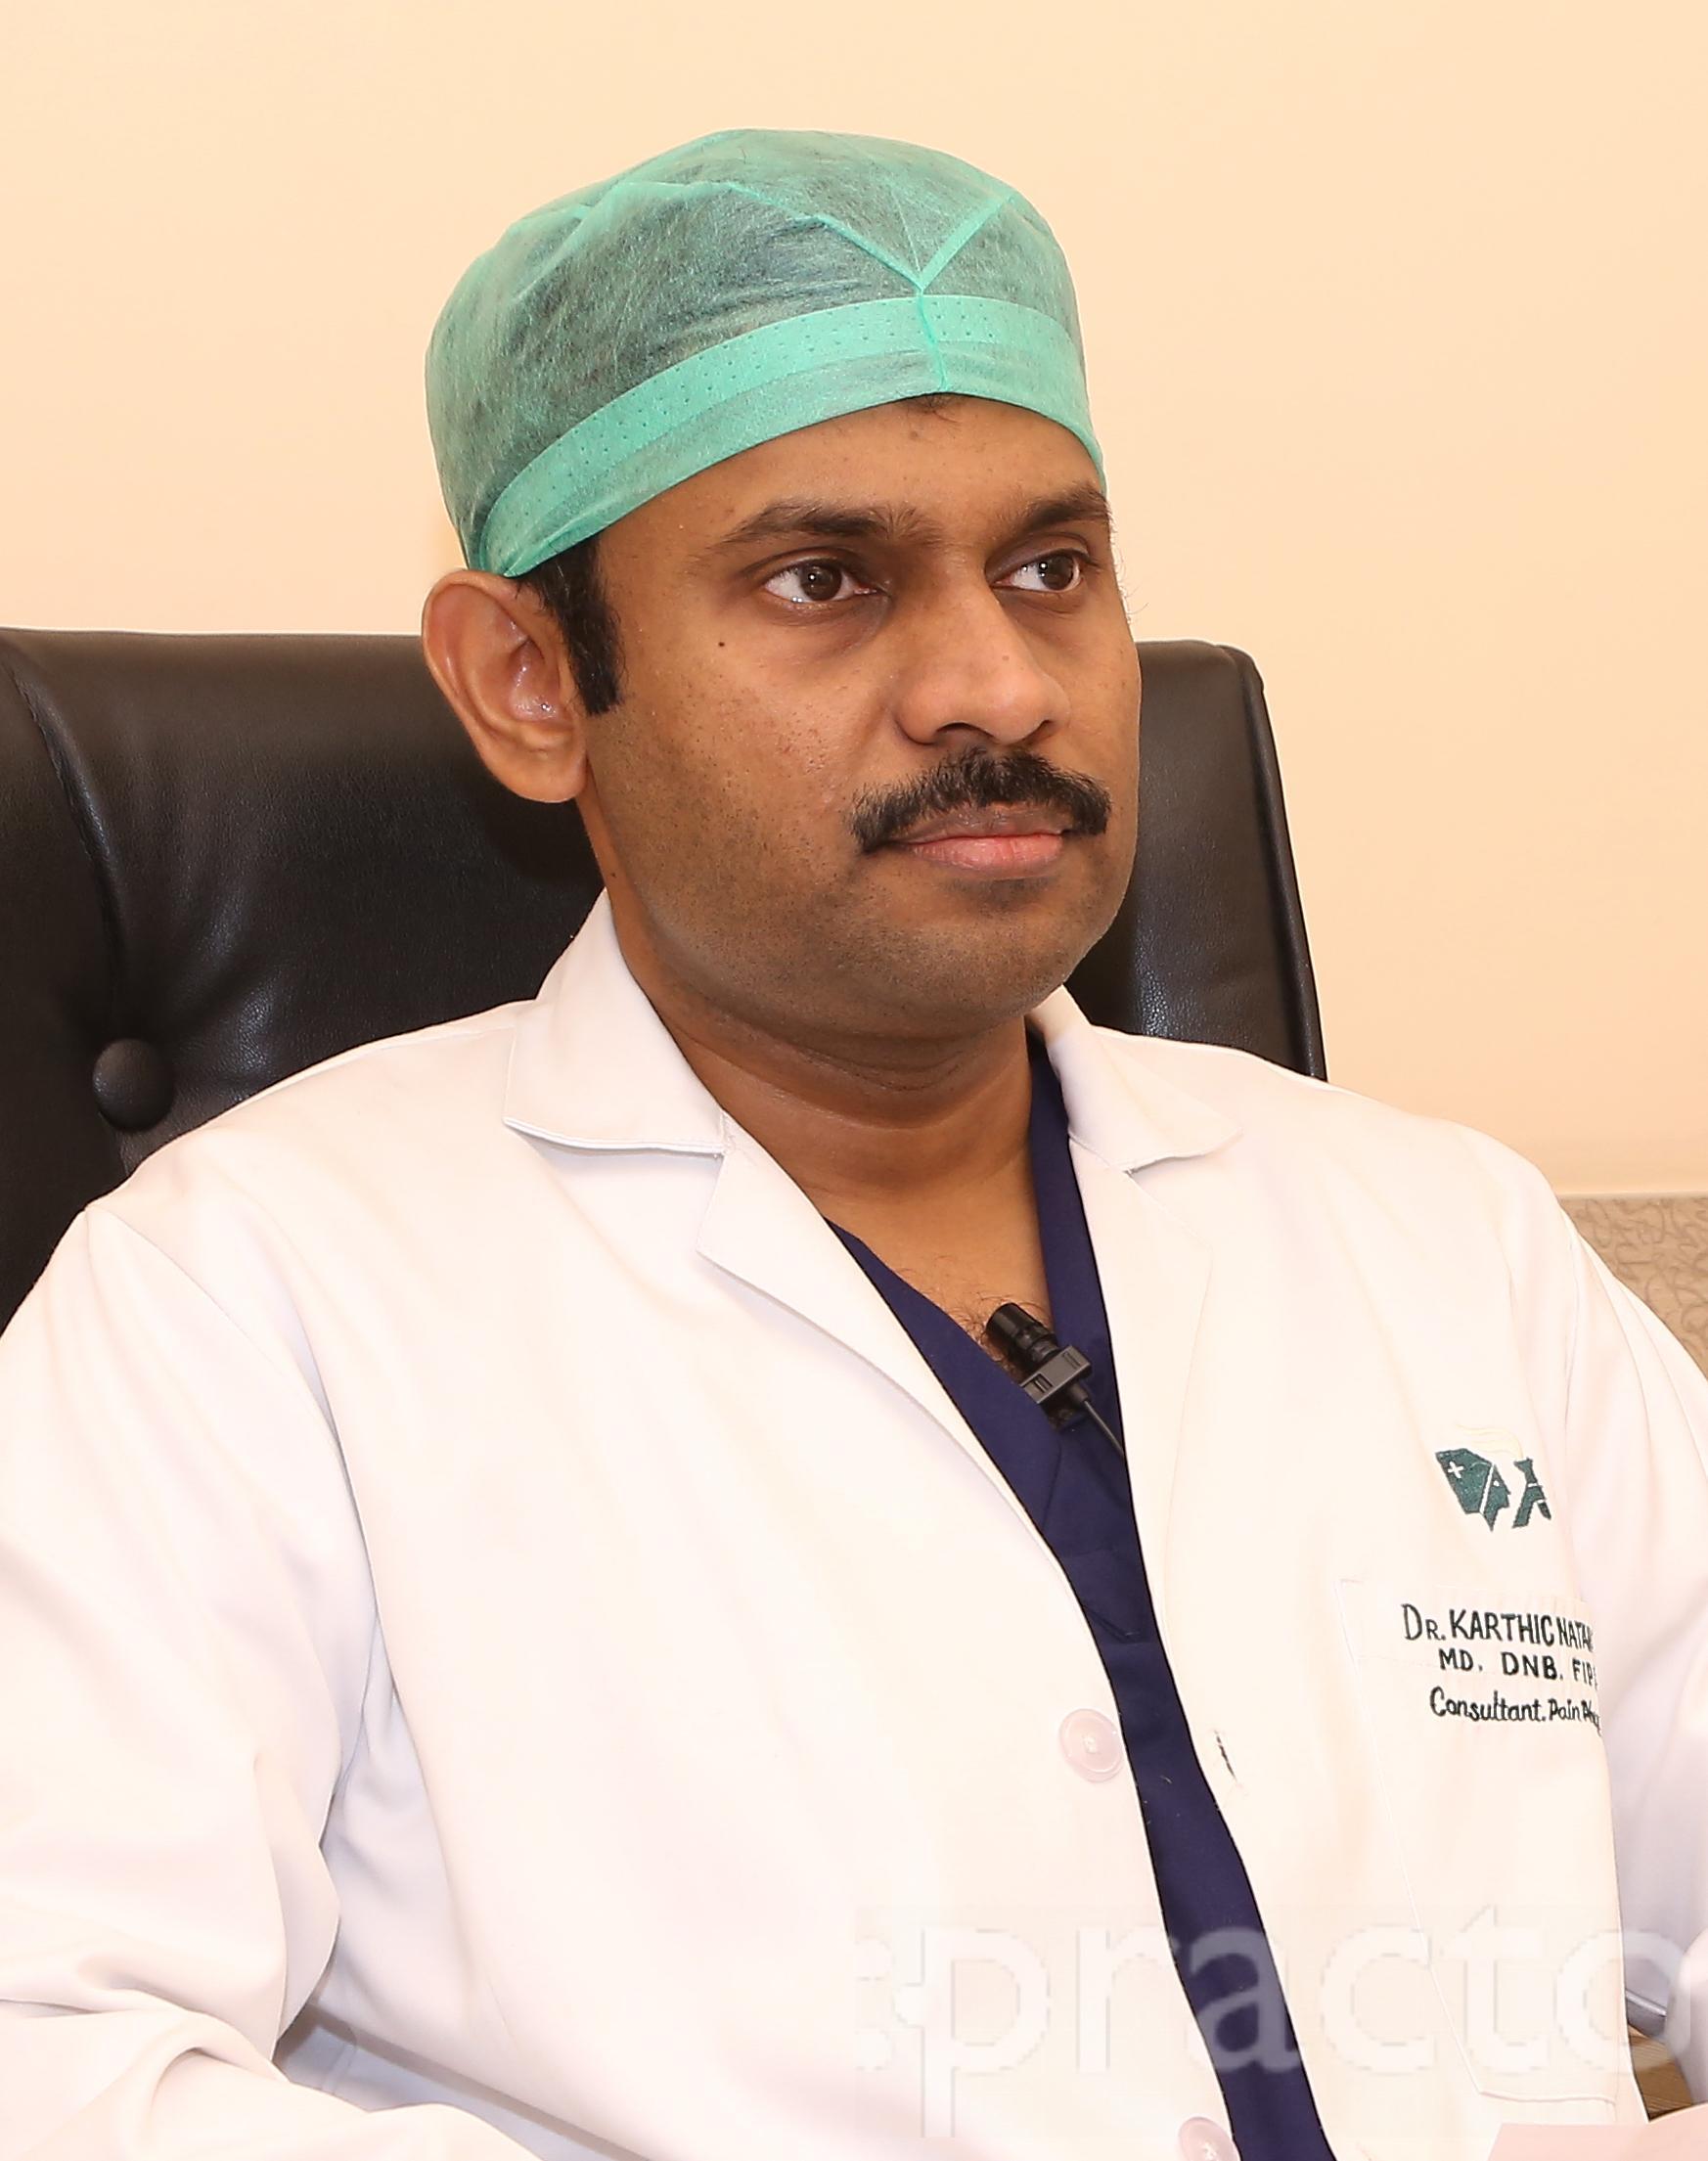 Dr. Karthic Babu Natarajan - Spine and Pain Specialist